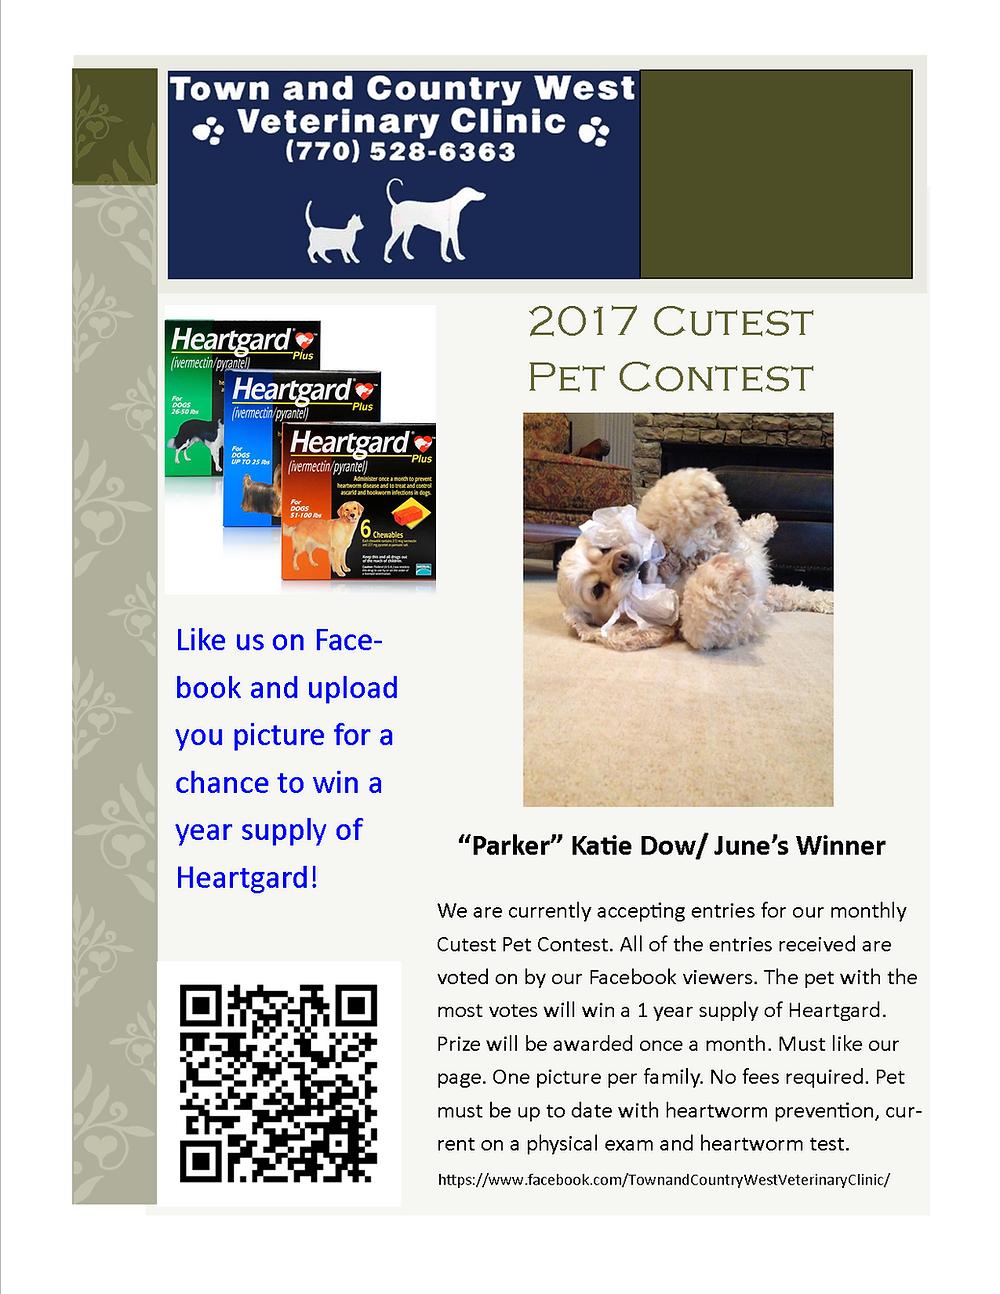 Cutest Pet Contest Winner June 2017